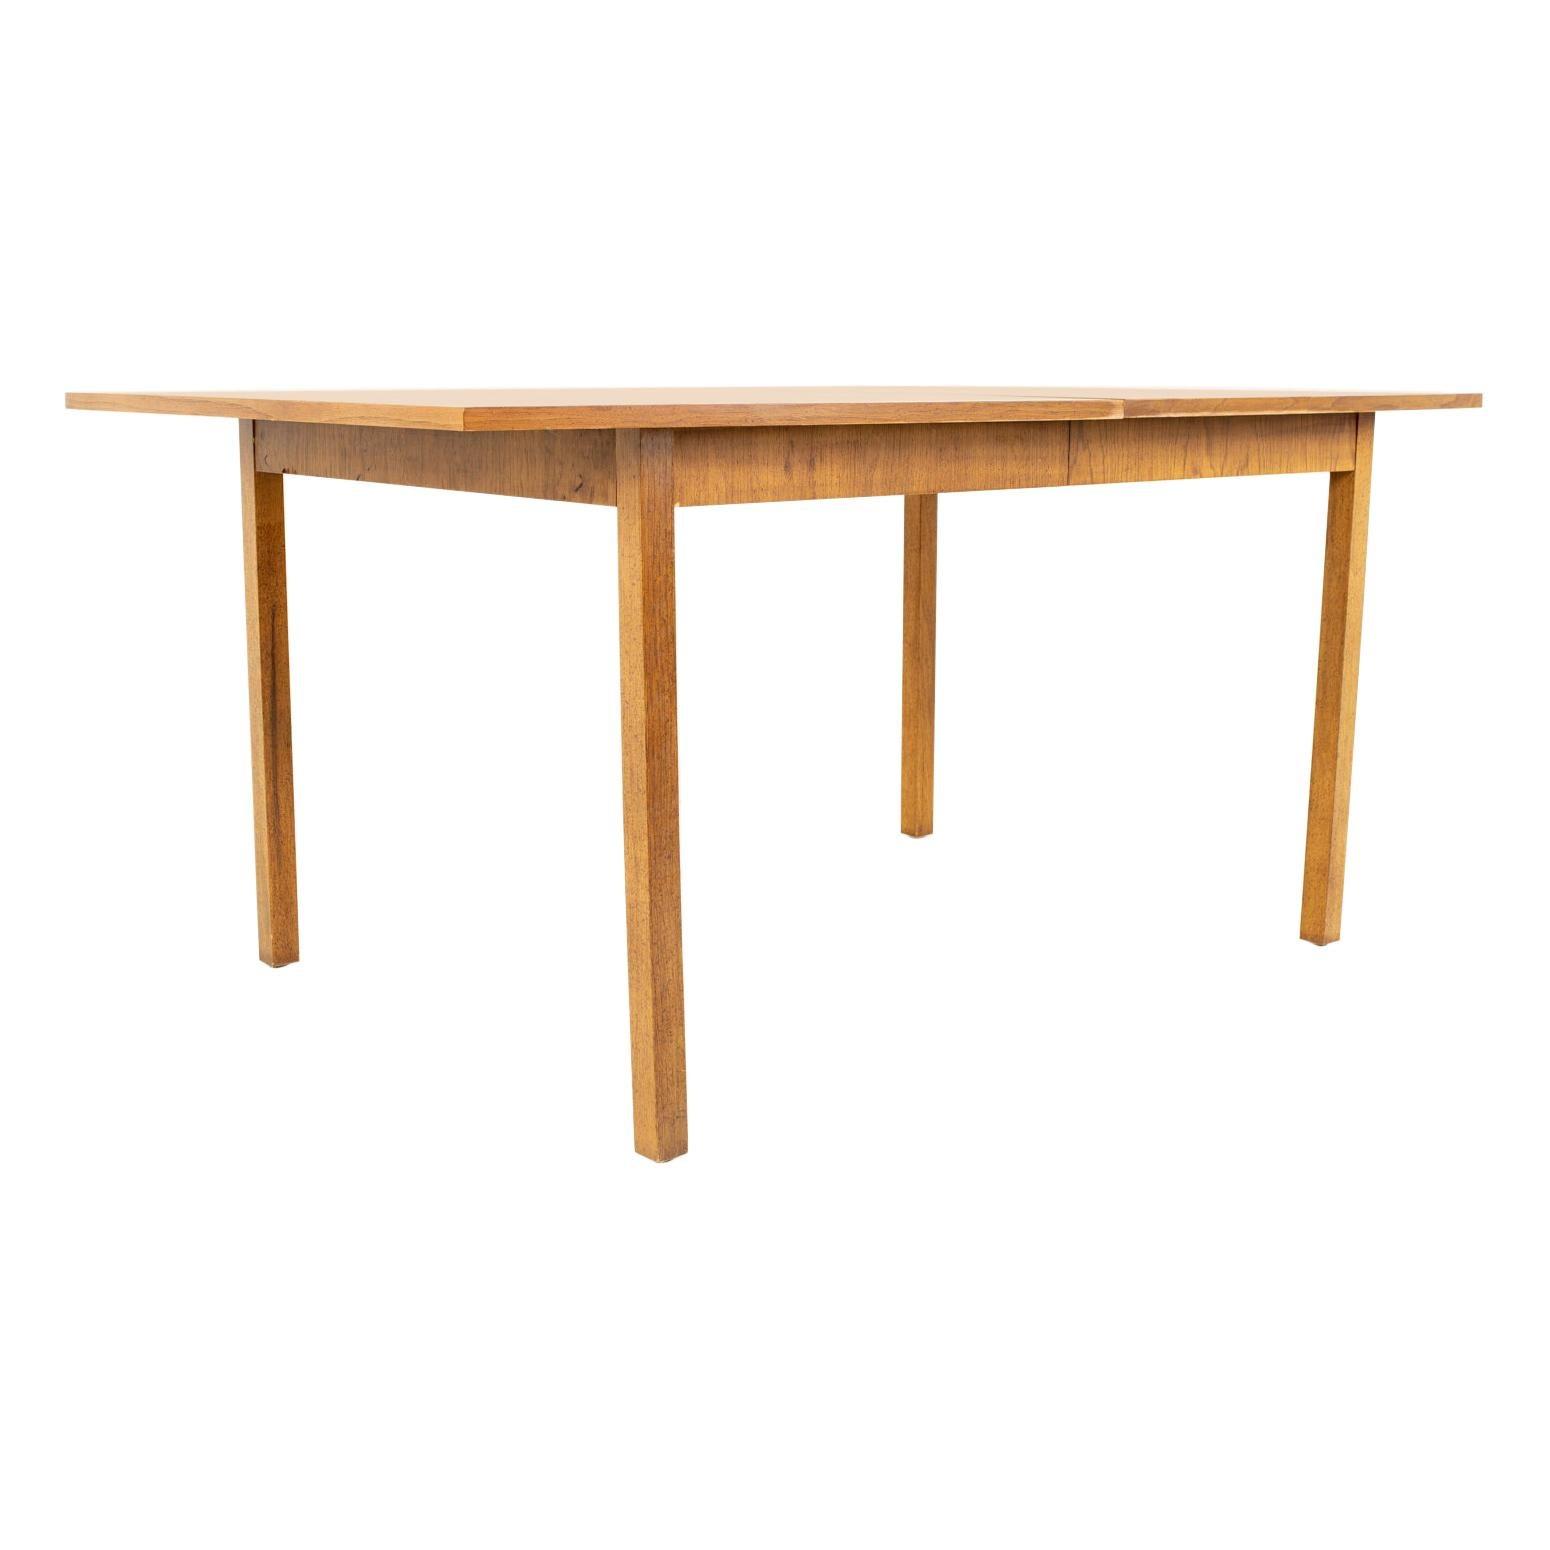 Bernhardt Furniture Mid Century Walnut Surfboard Dining Table